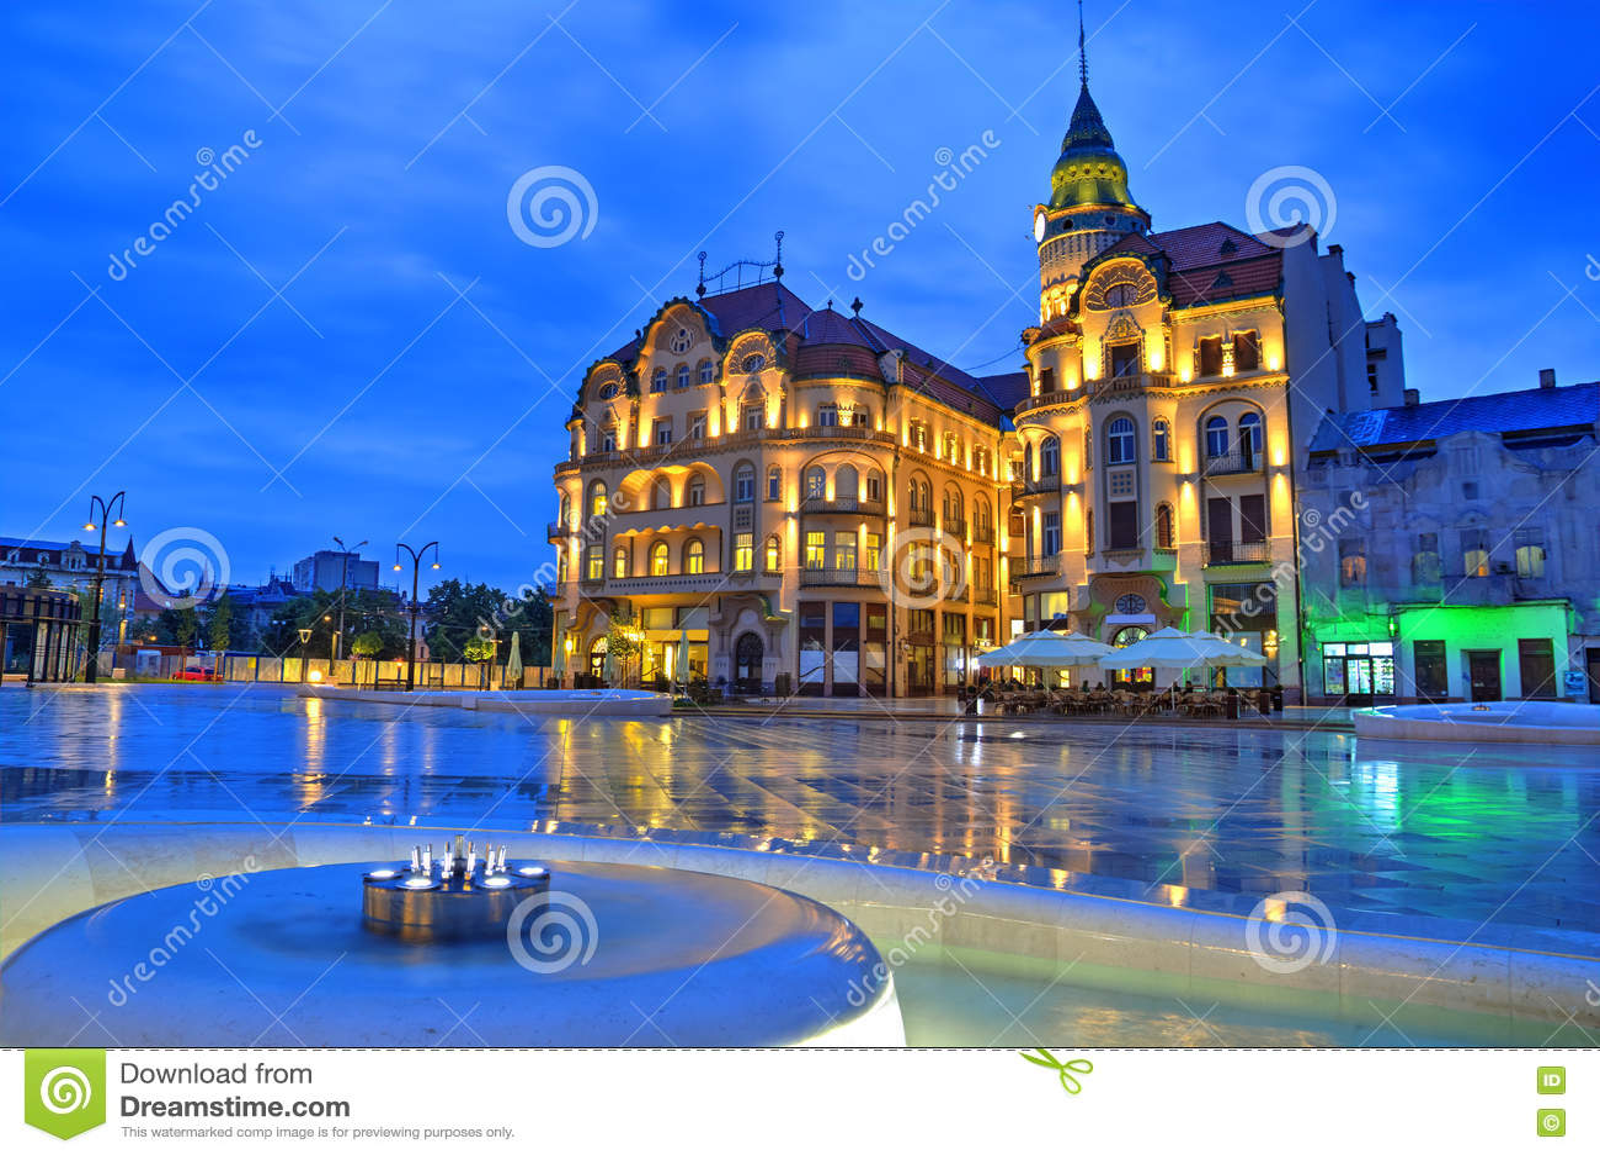 Stadt Rumänien